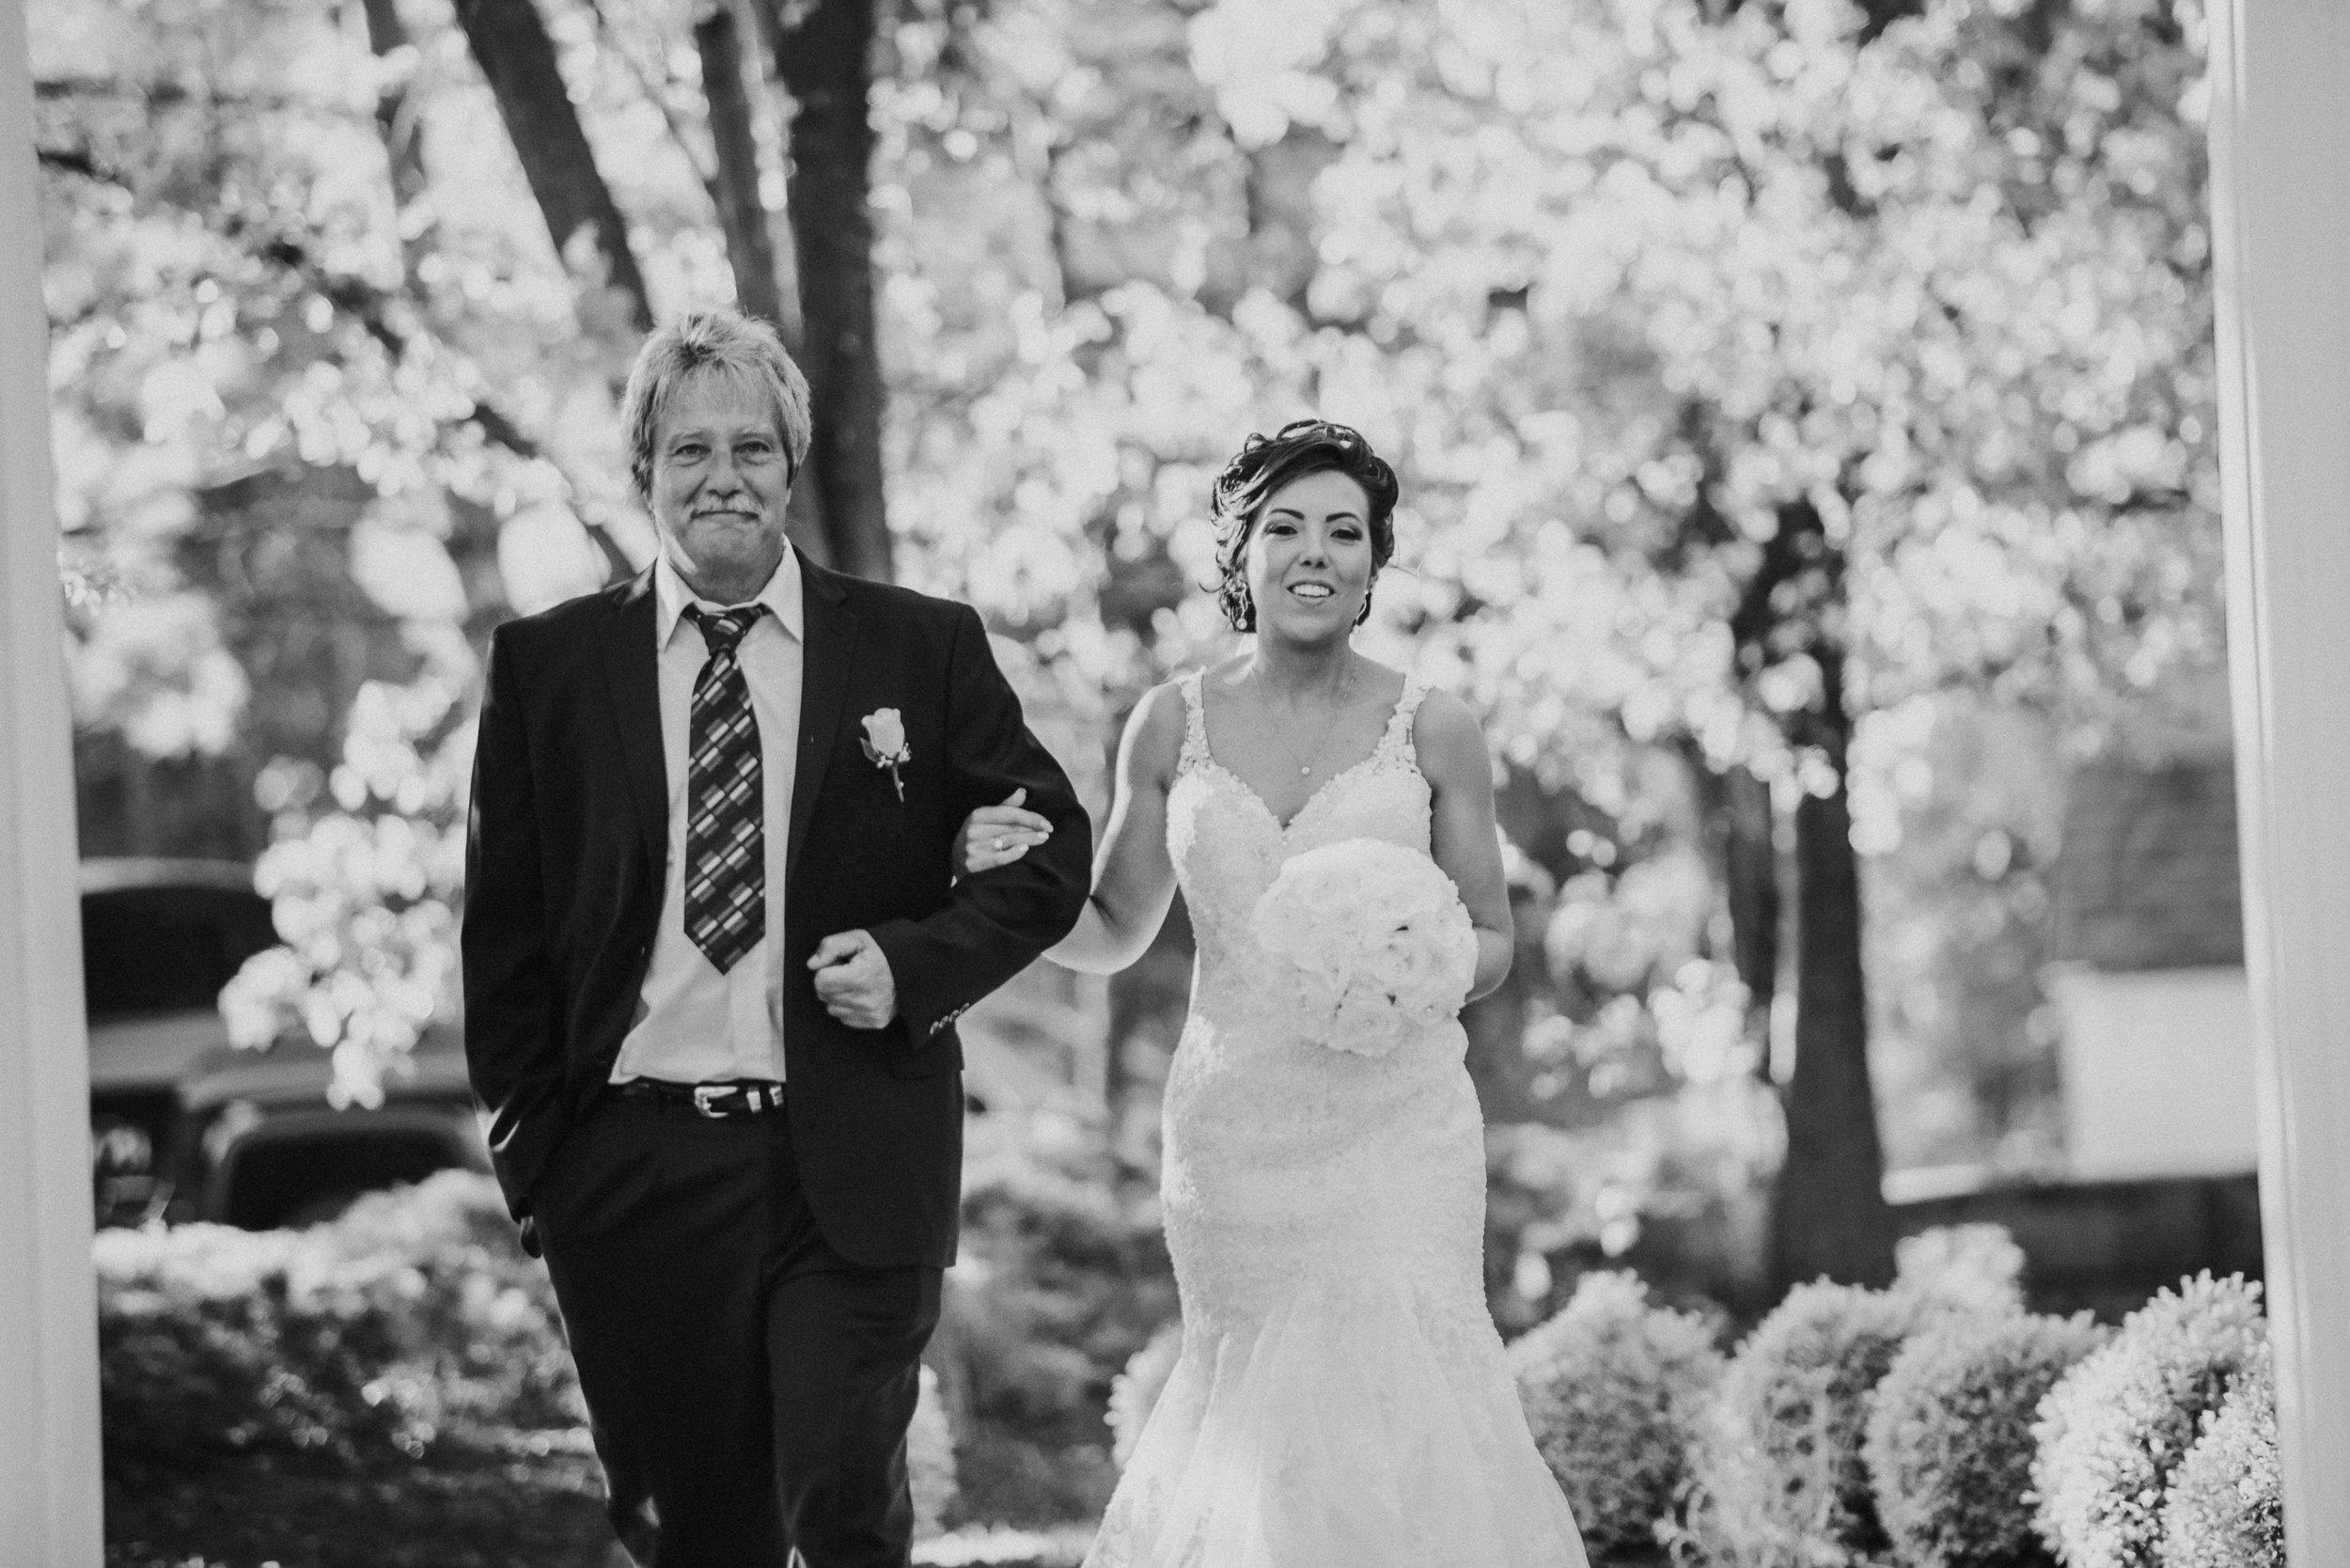 Christina-and-Gene-Wedding-Marla-Rain-Photography-316.jpg